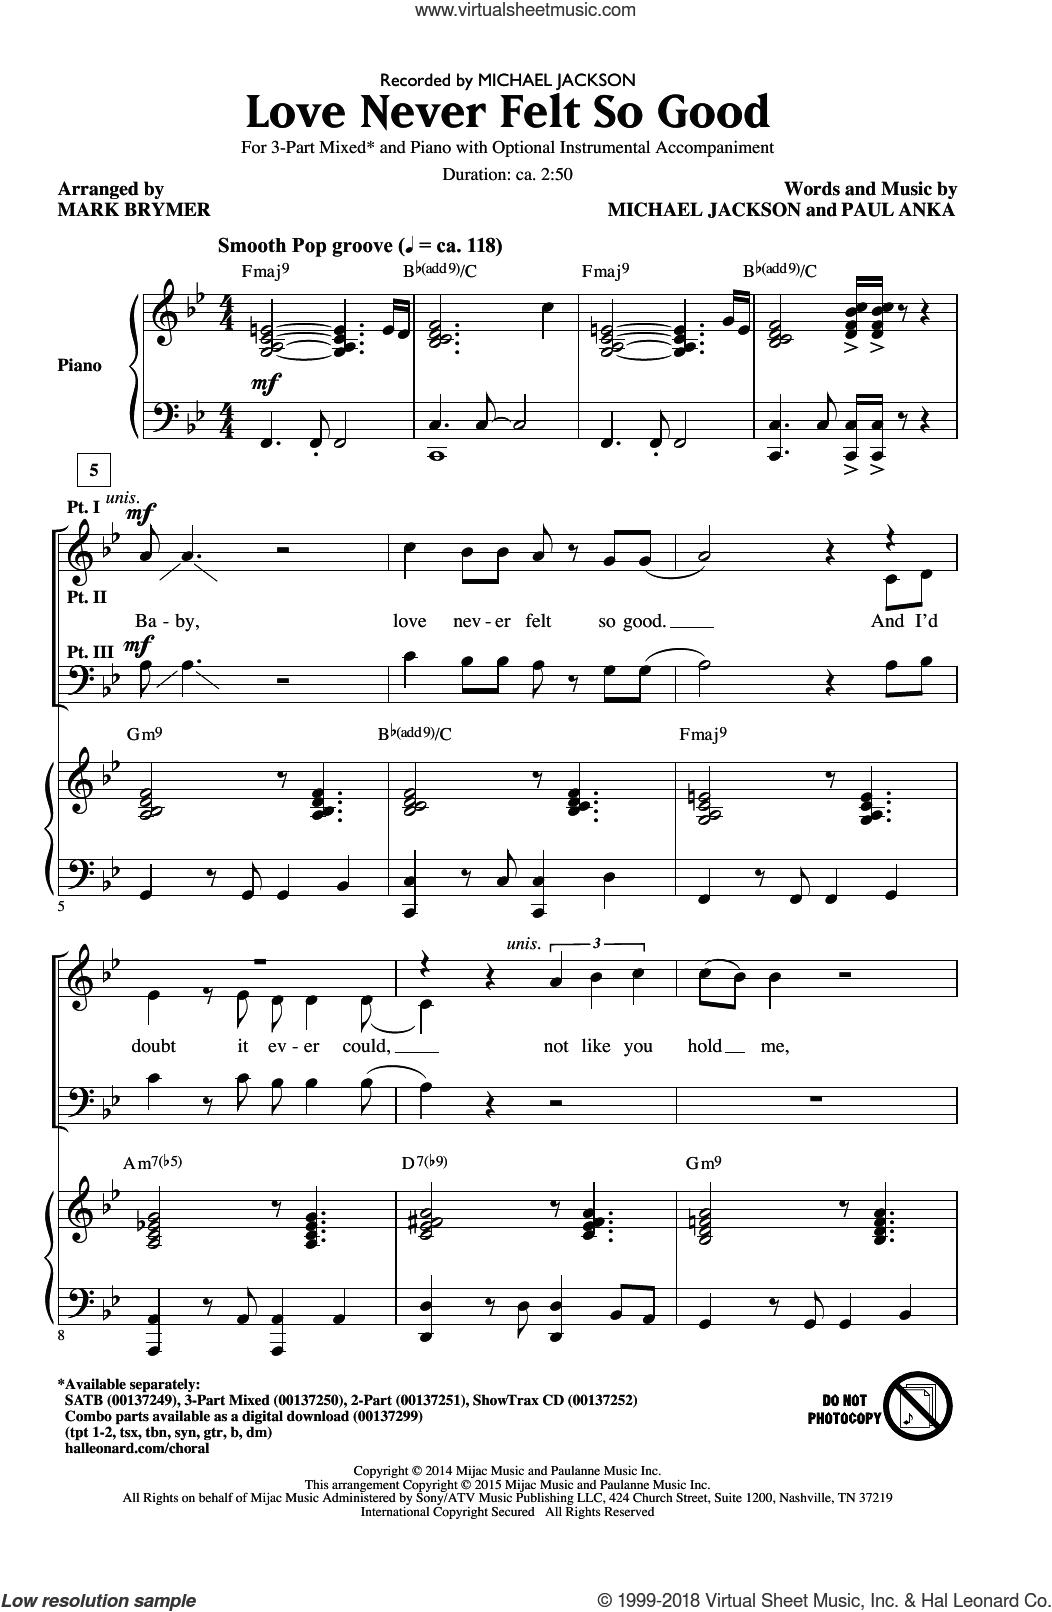 Love Never Felt So Good sheet music for choir (3-Part Mixed) by Michael Jackson, Mark Brymer, Michael Jackson & Justin Timberlake and Paul Anka, intermediate skill level